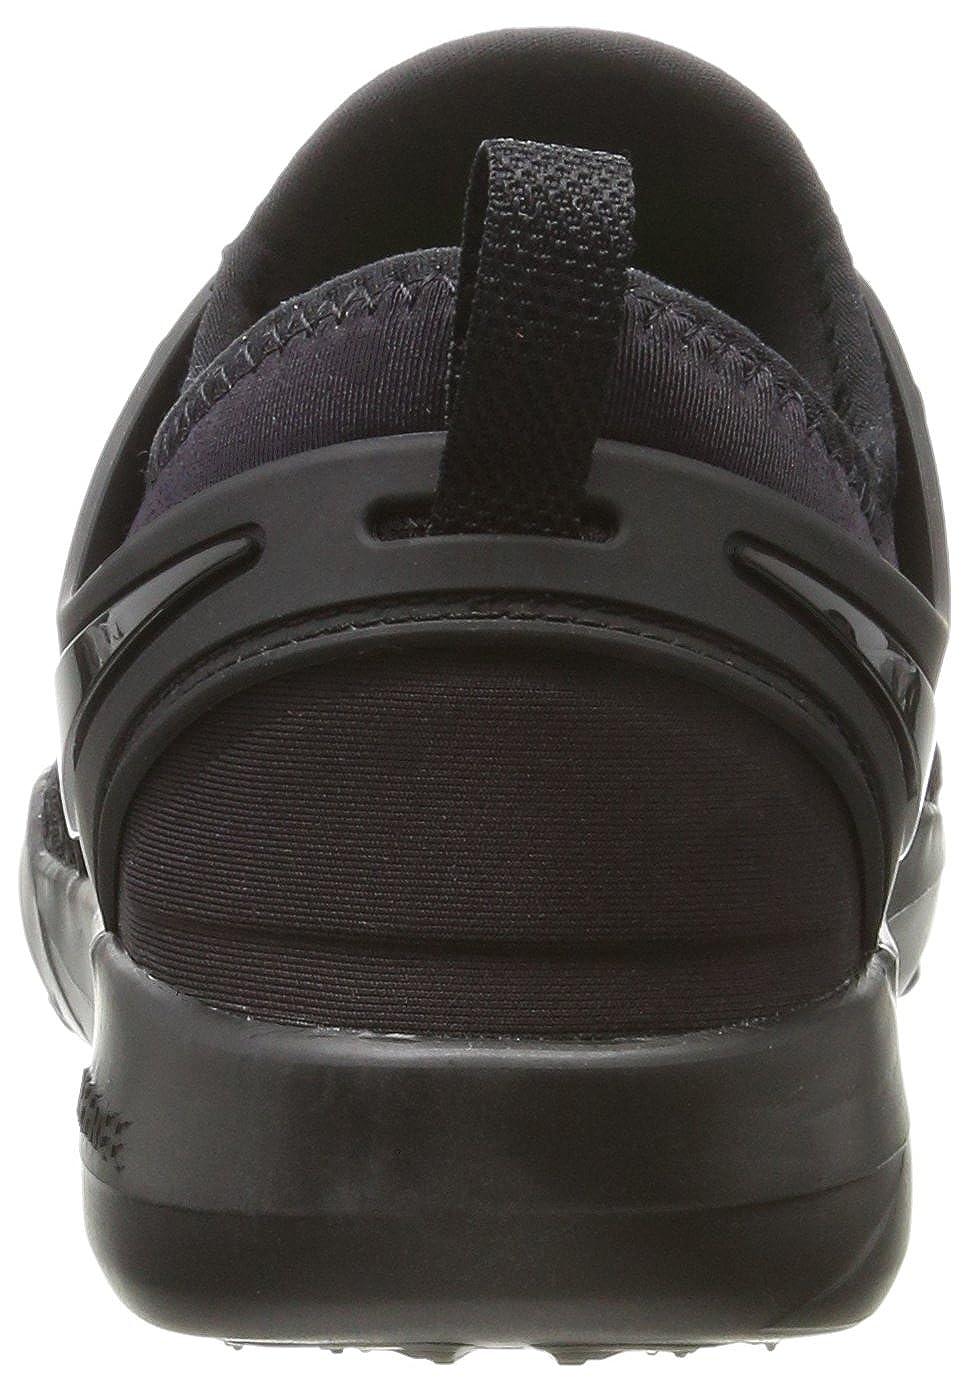 best website 85308 a4e10 ... Nike Women s WMNS Free TR TR TR 7, Black Black-Dark Grey B00F1CFB0G ...